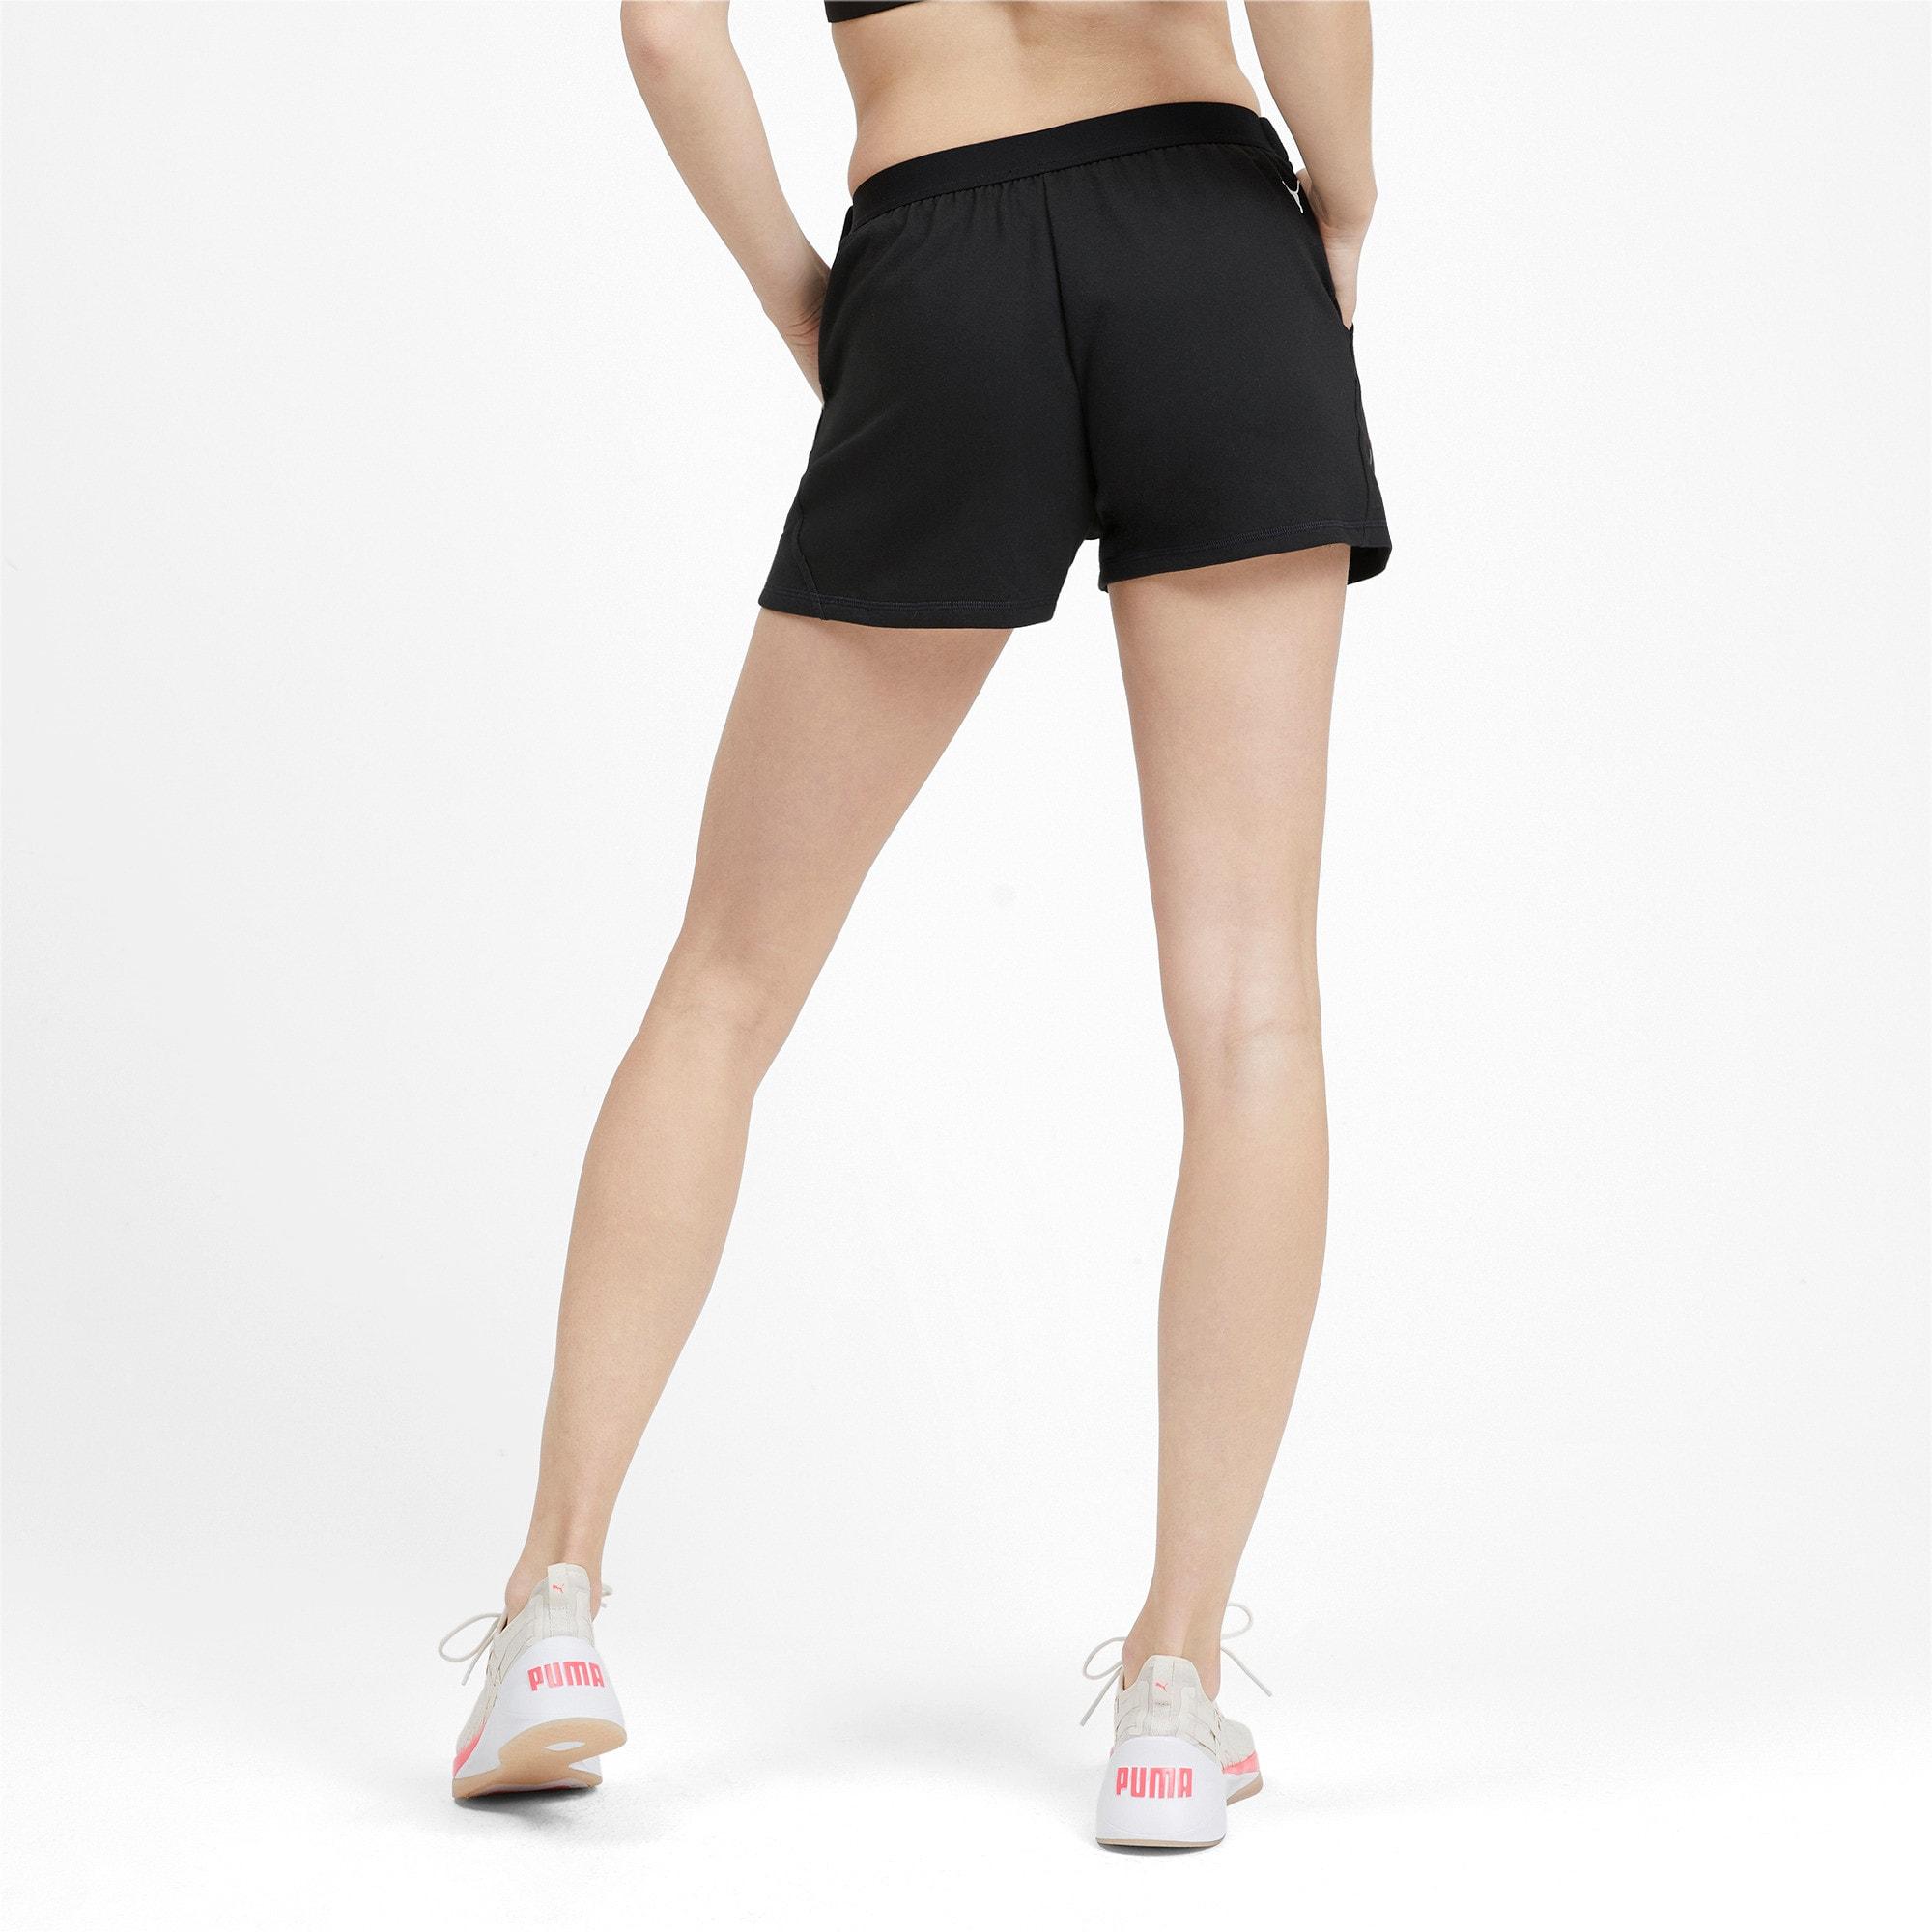 Miniatura 3 de Shorts HIT Feel It para mujer, Puma Black, mediano